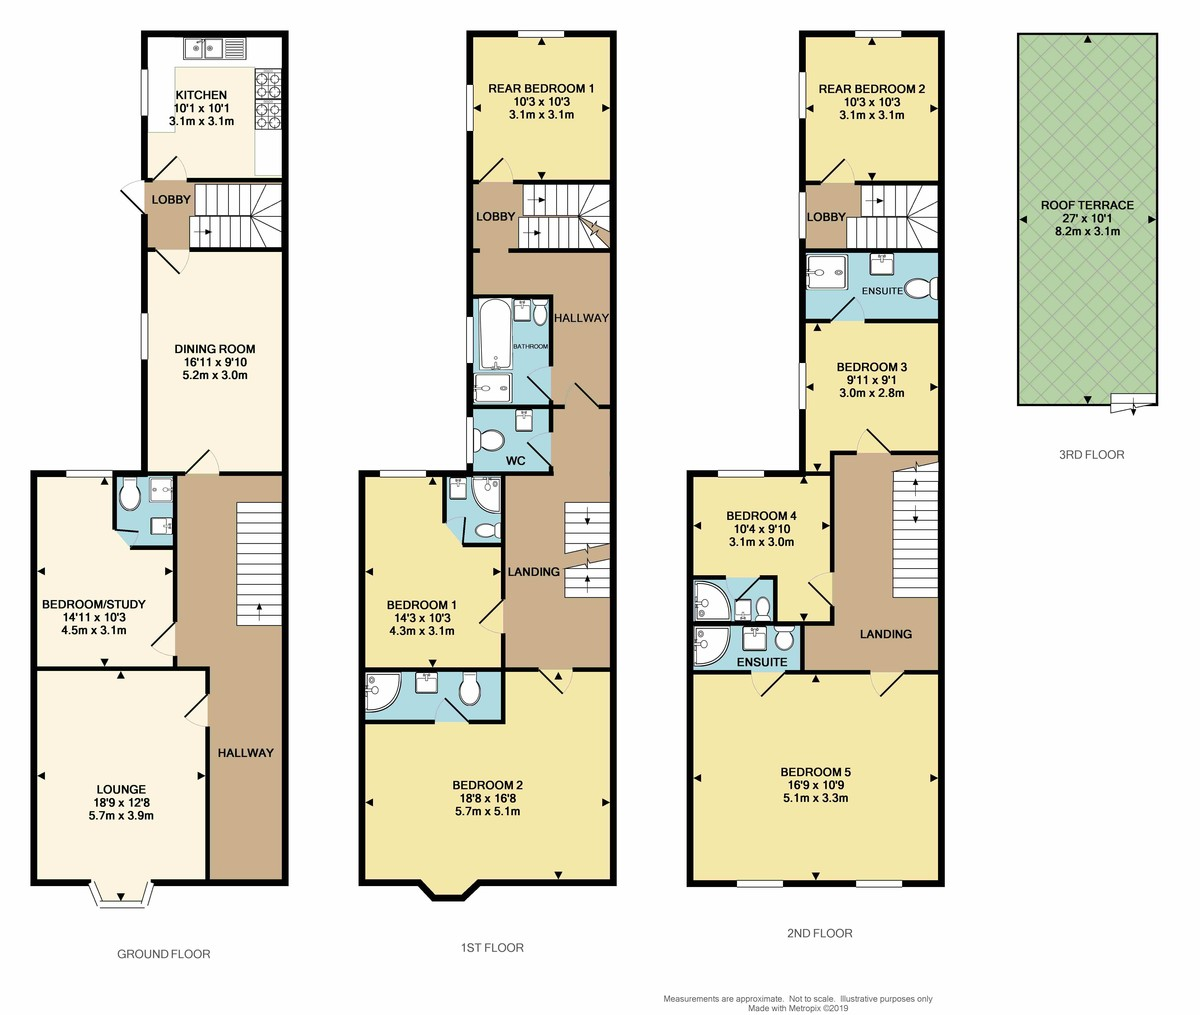 St Malo Guest House, 19 Garden Crescent, The Hoe, Plymouth,  PL1 3DA floorplan